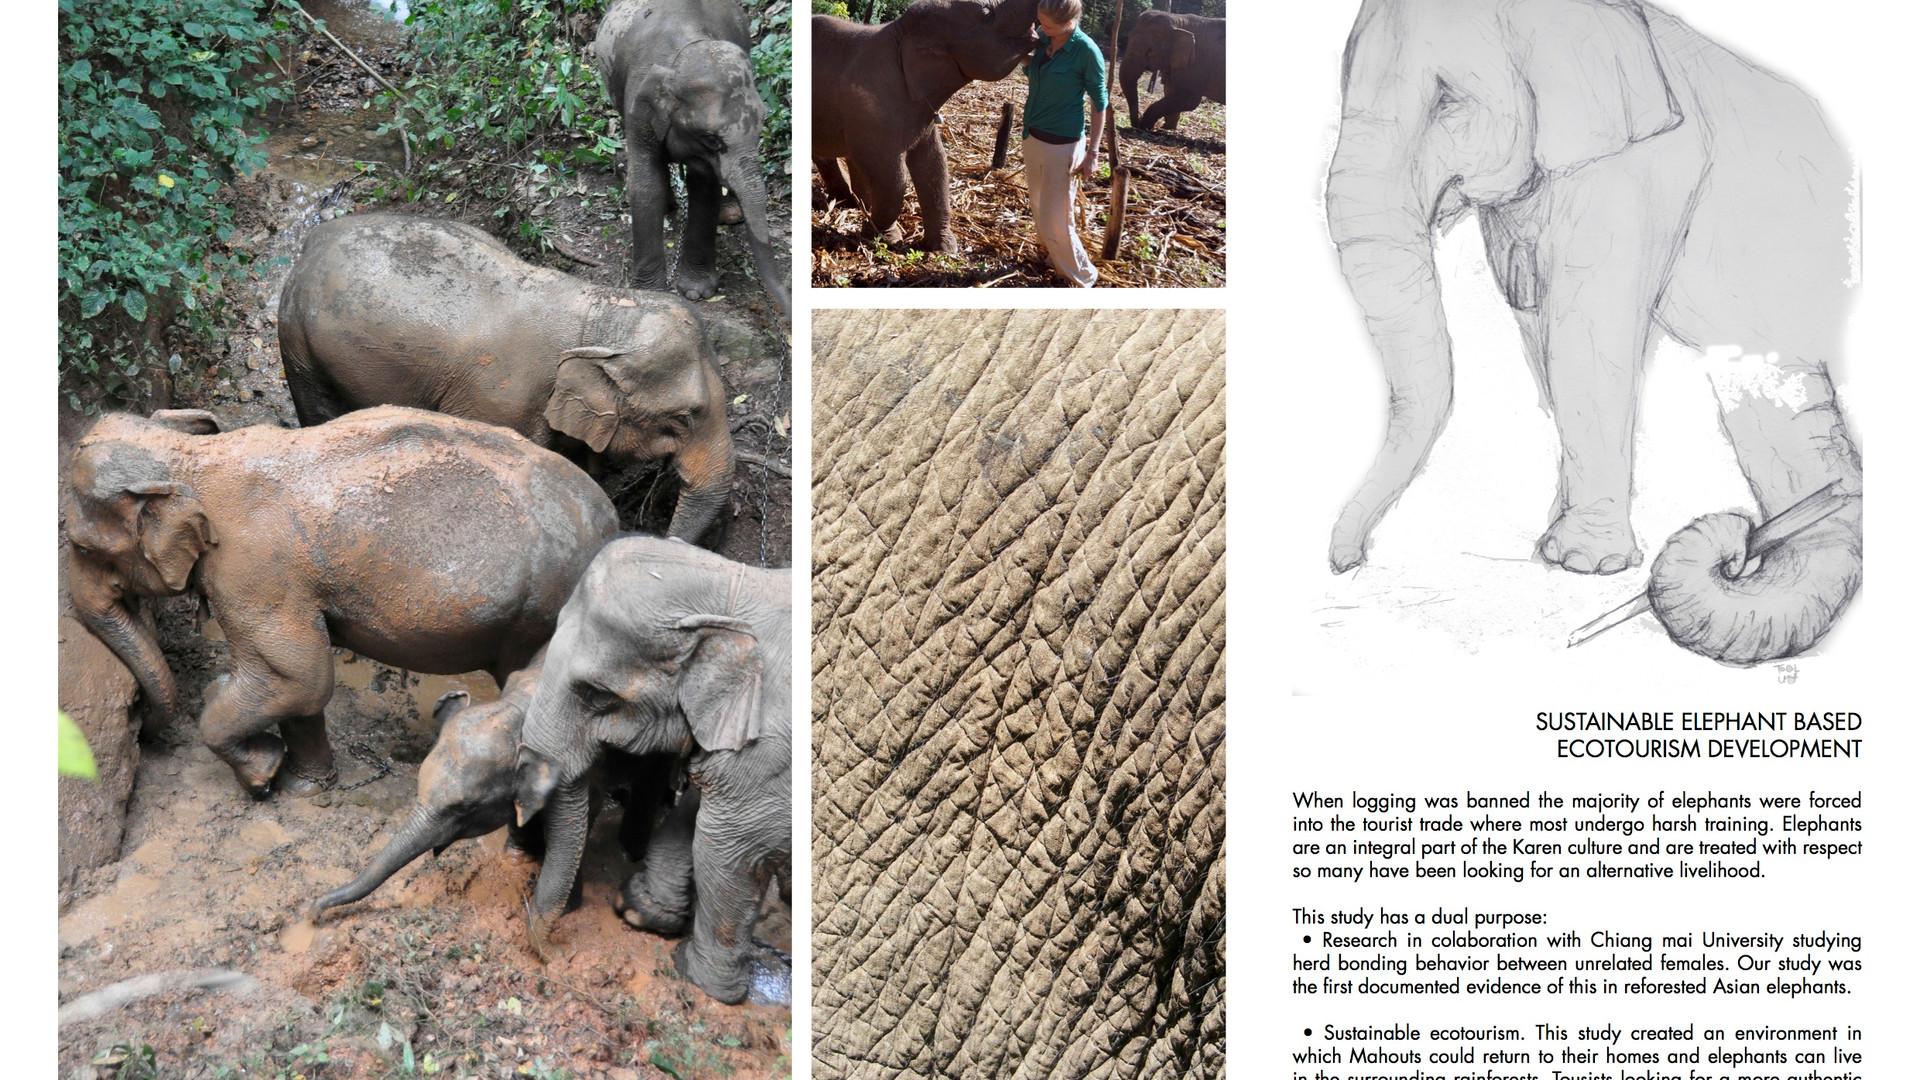 Ecotourism Development